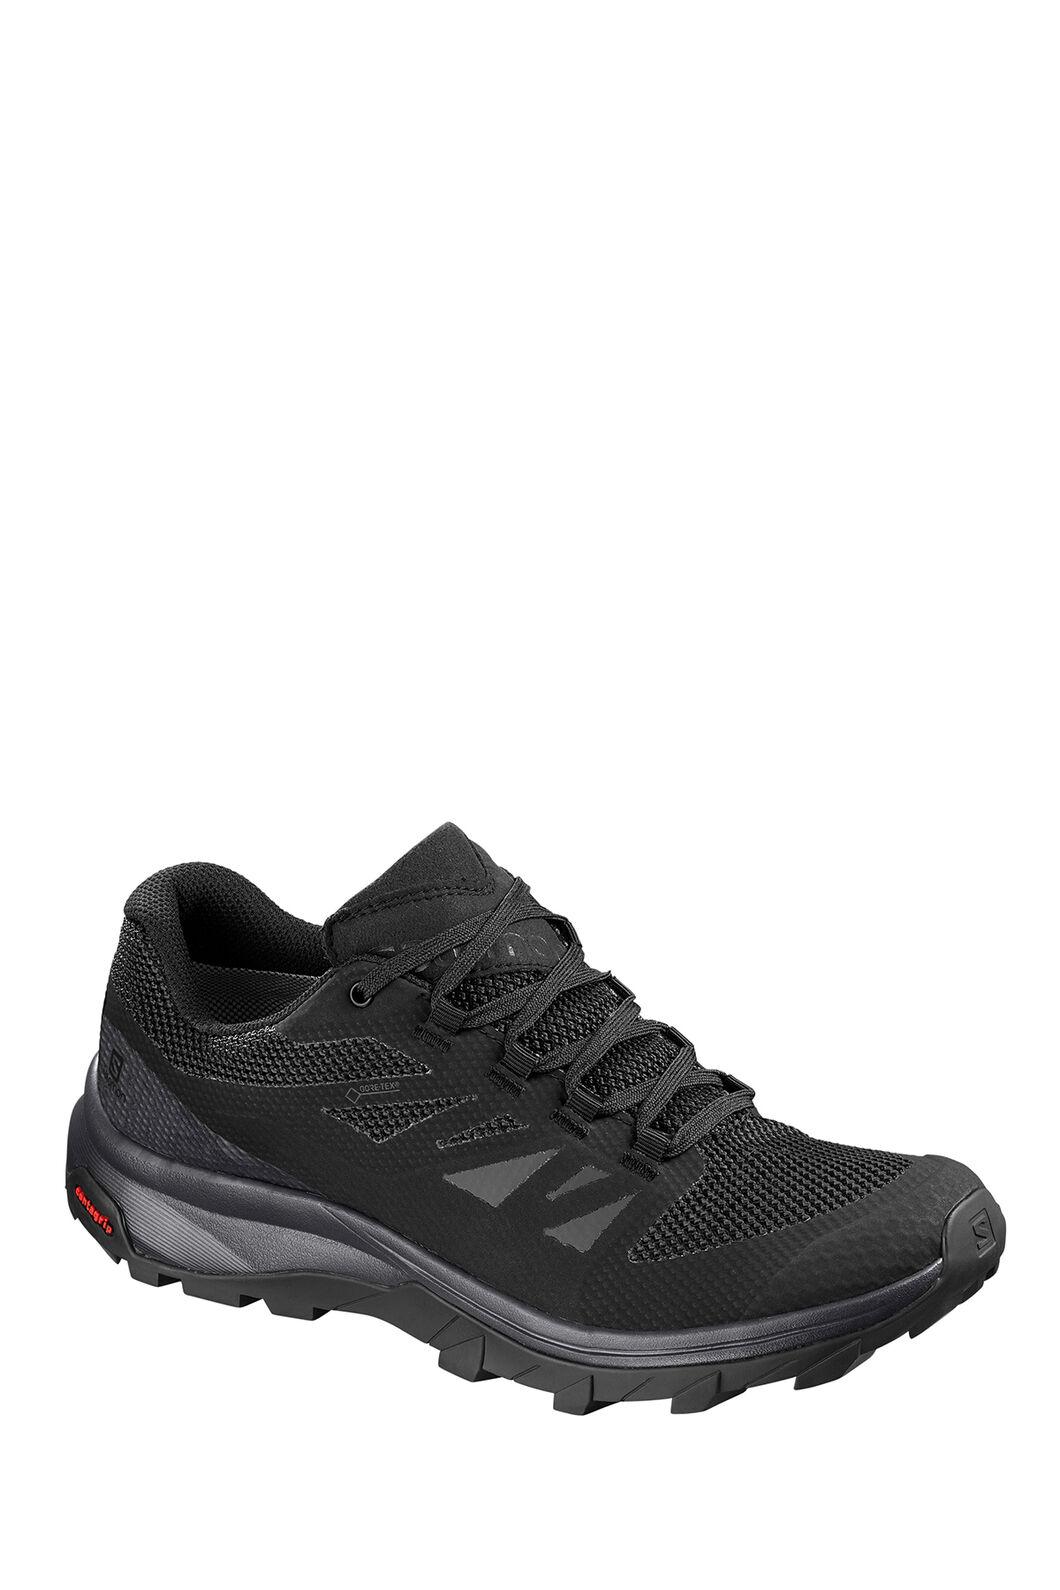 Salomon Outline GTX Hiking Shoes - Women's, Phantom/Black/Magnet, hi-res